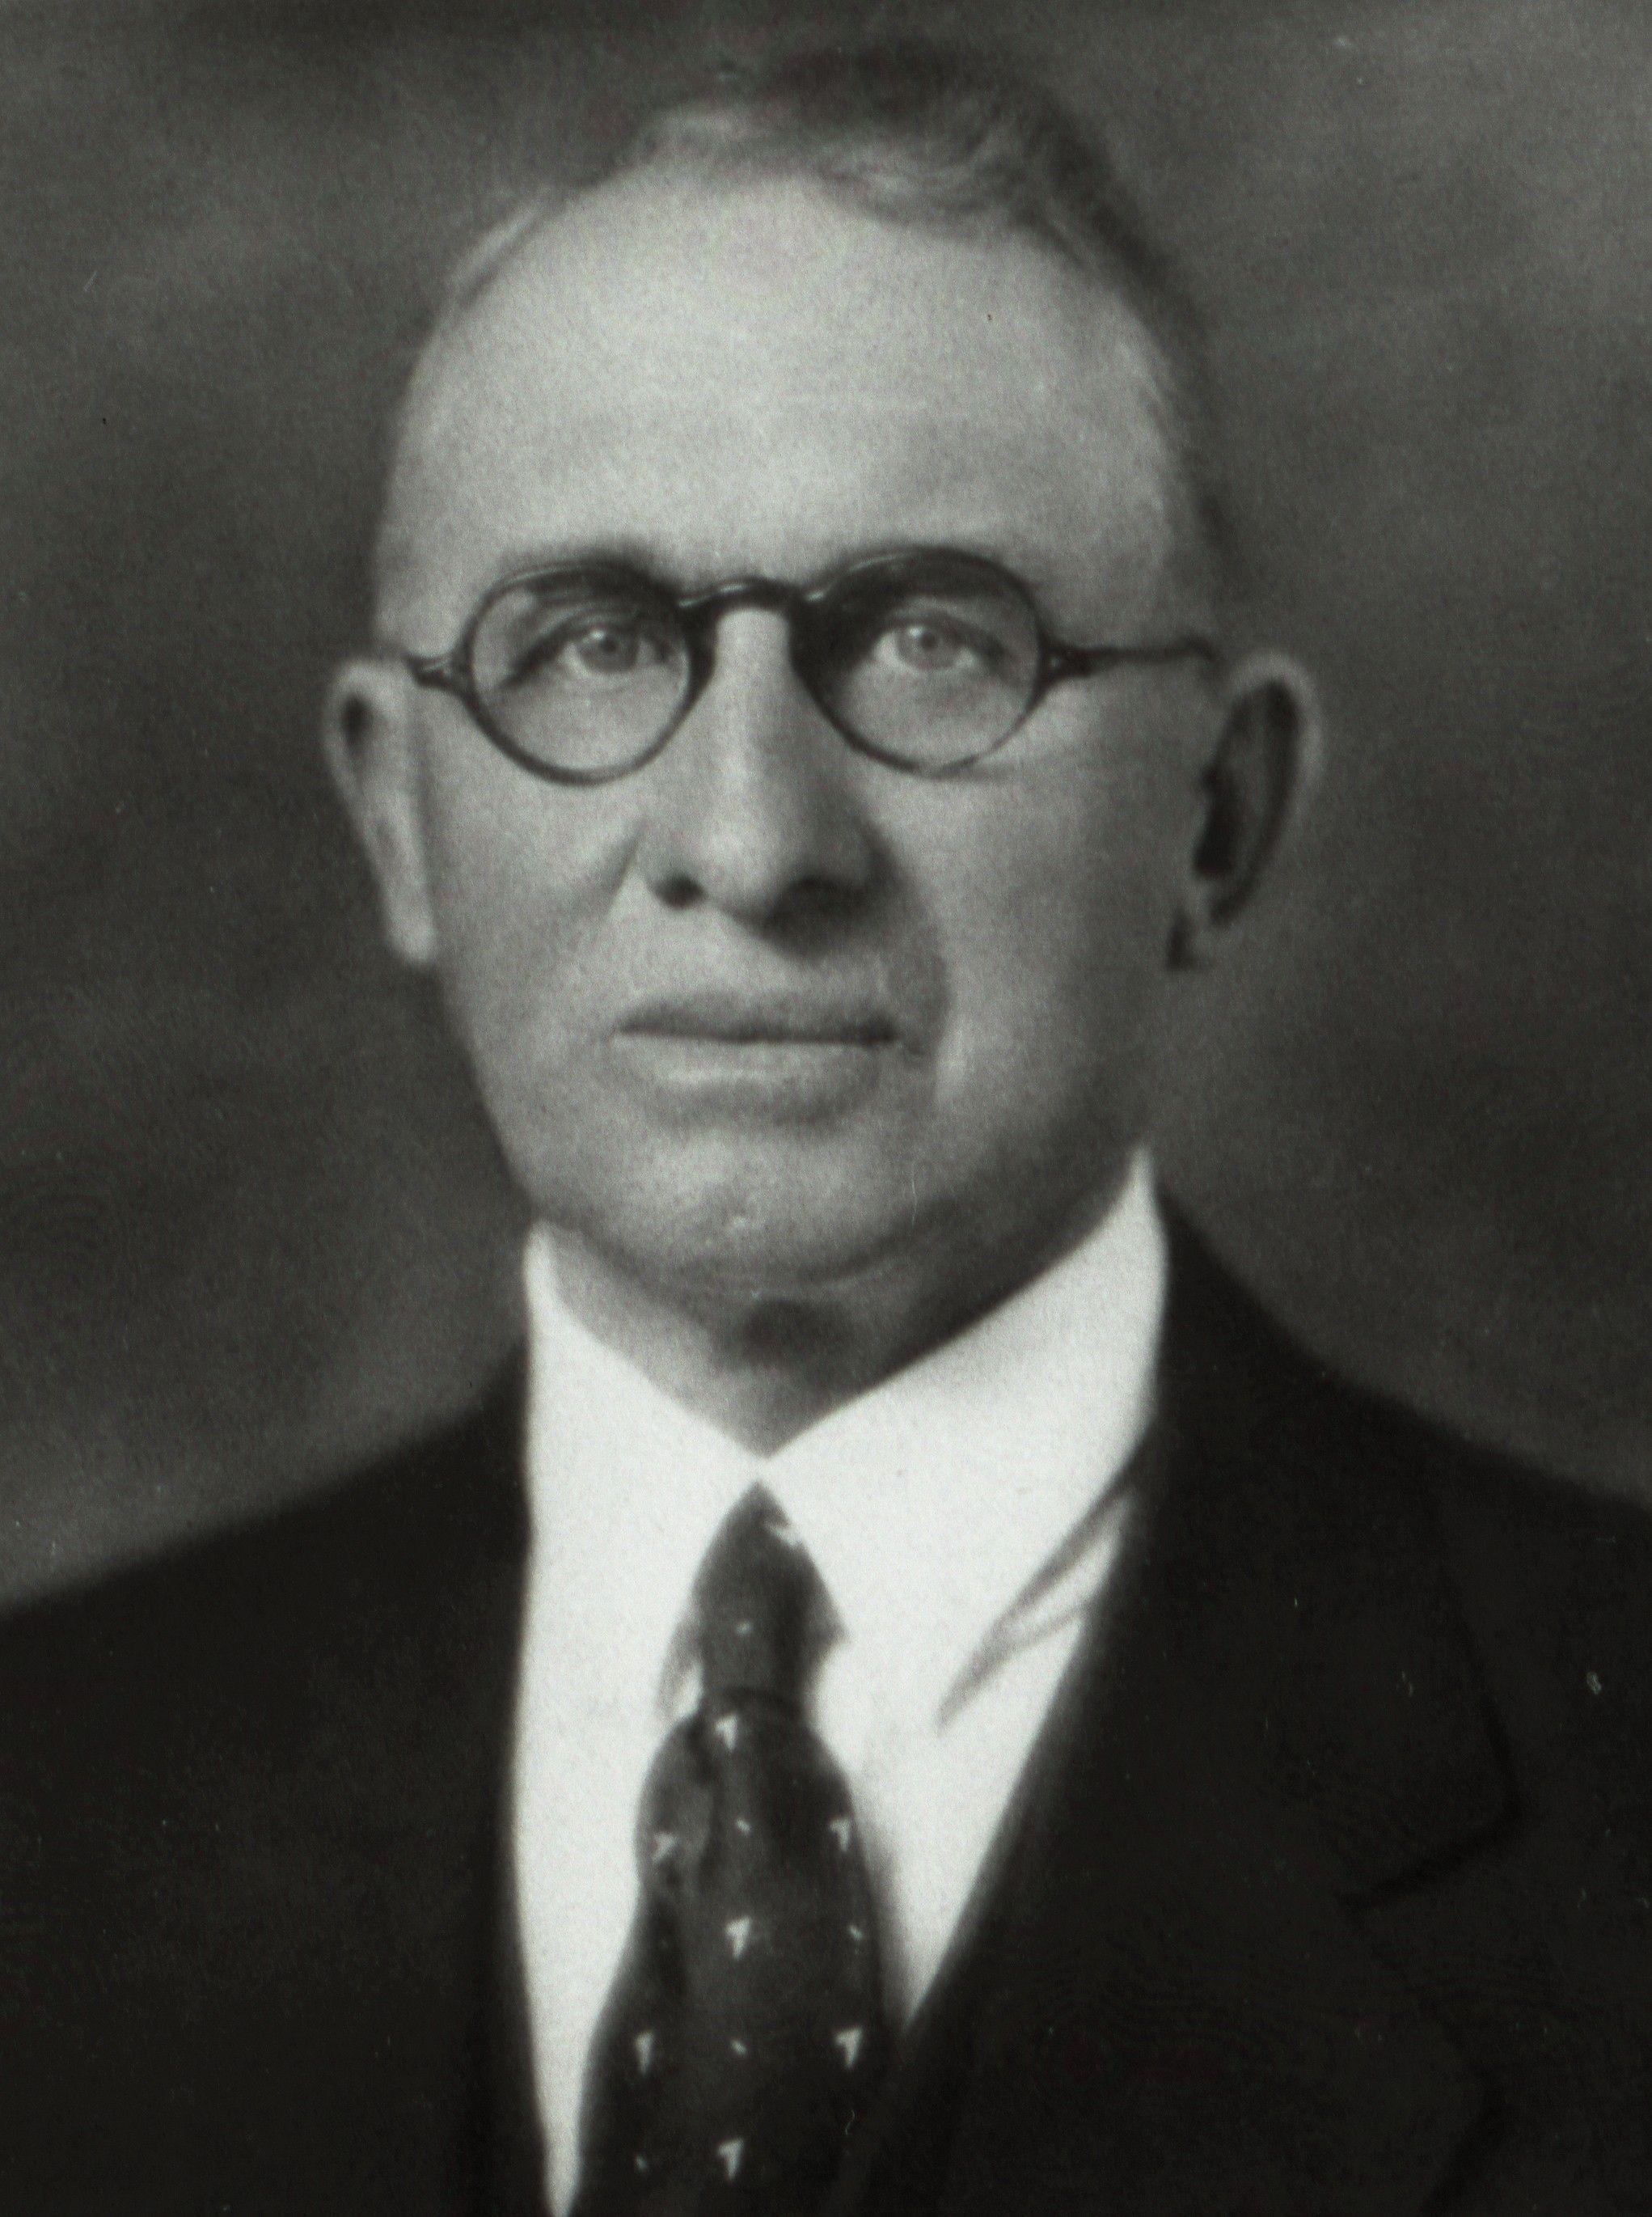 President Ezra Taft Benson's father, George Taft Benson Jr.